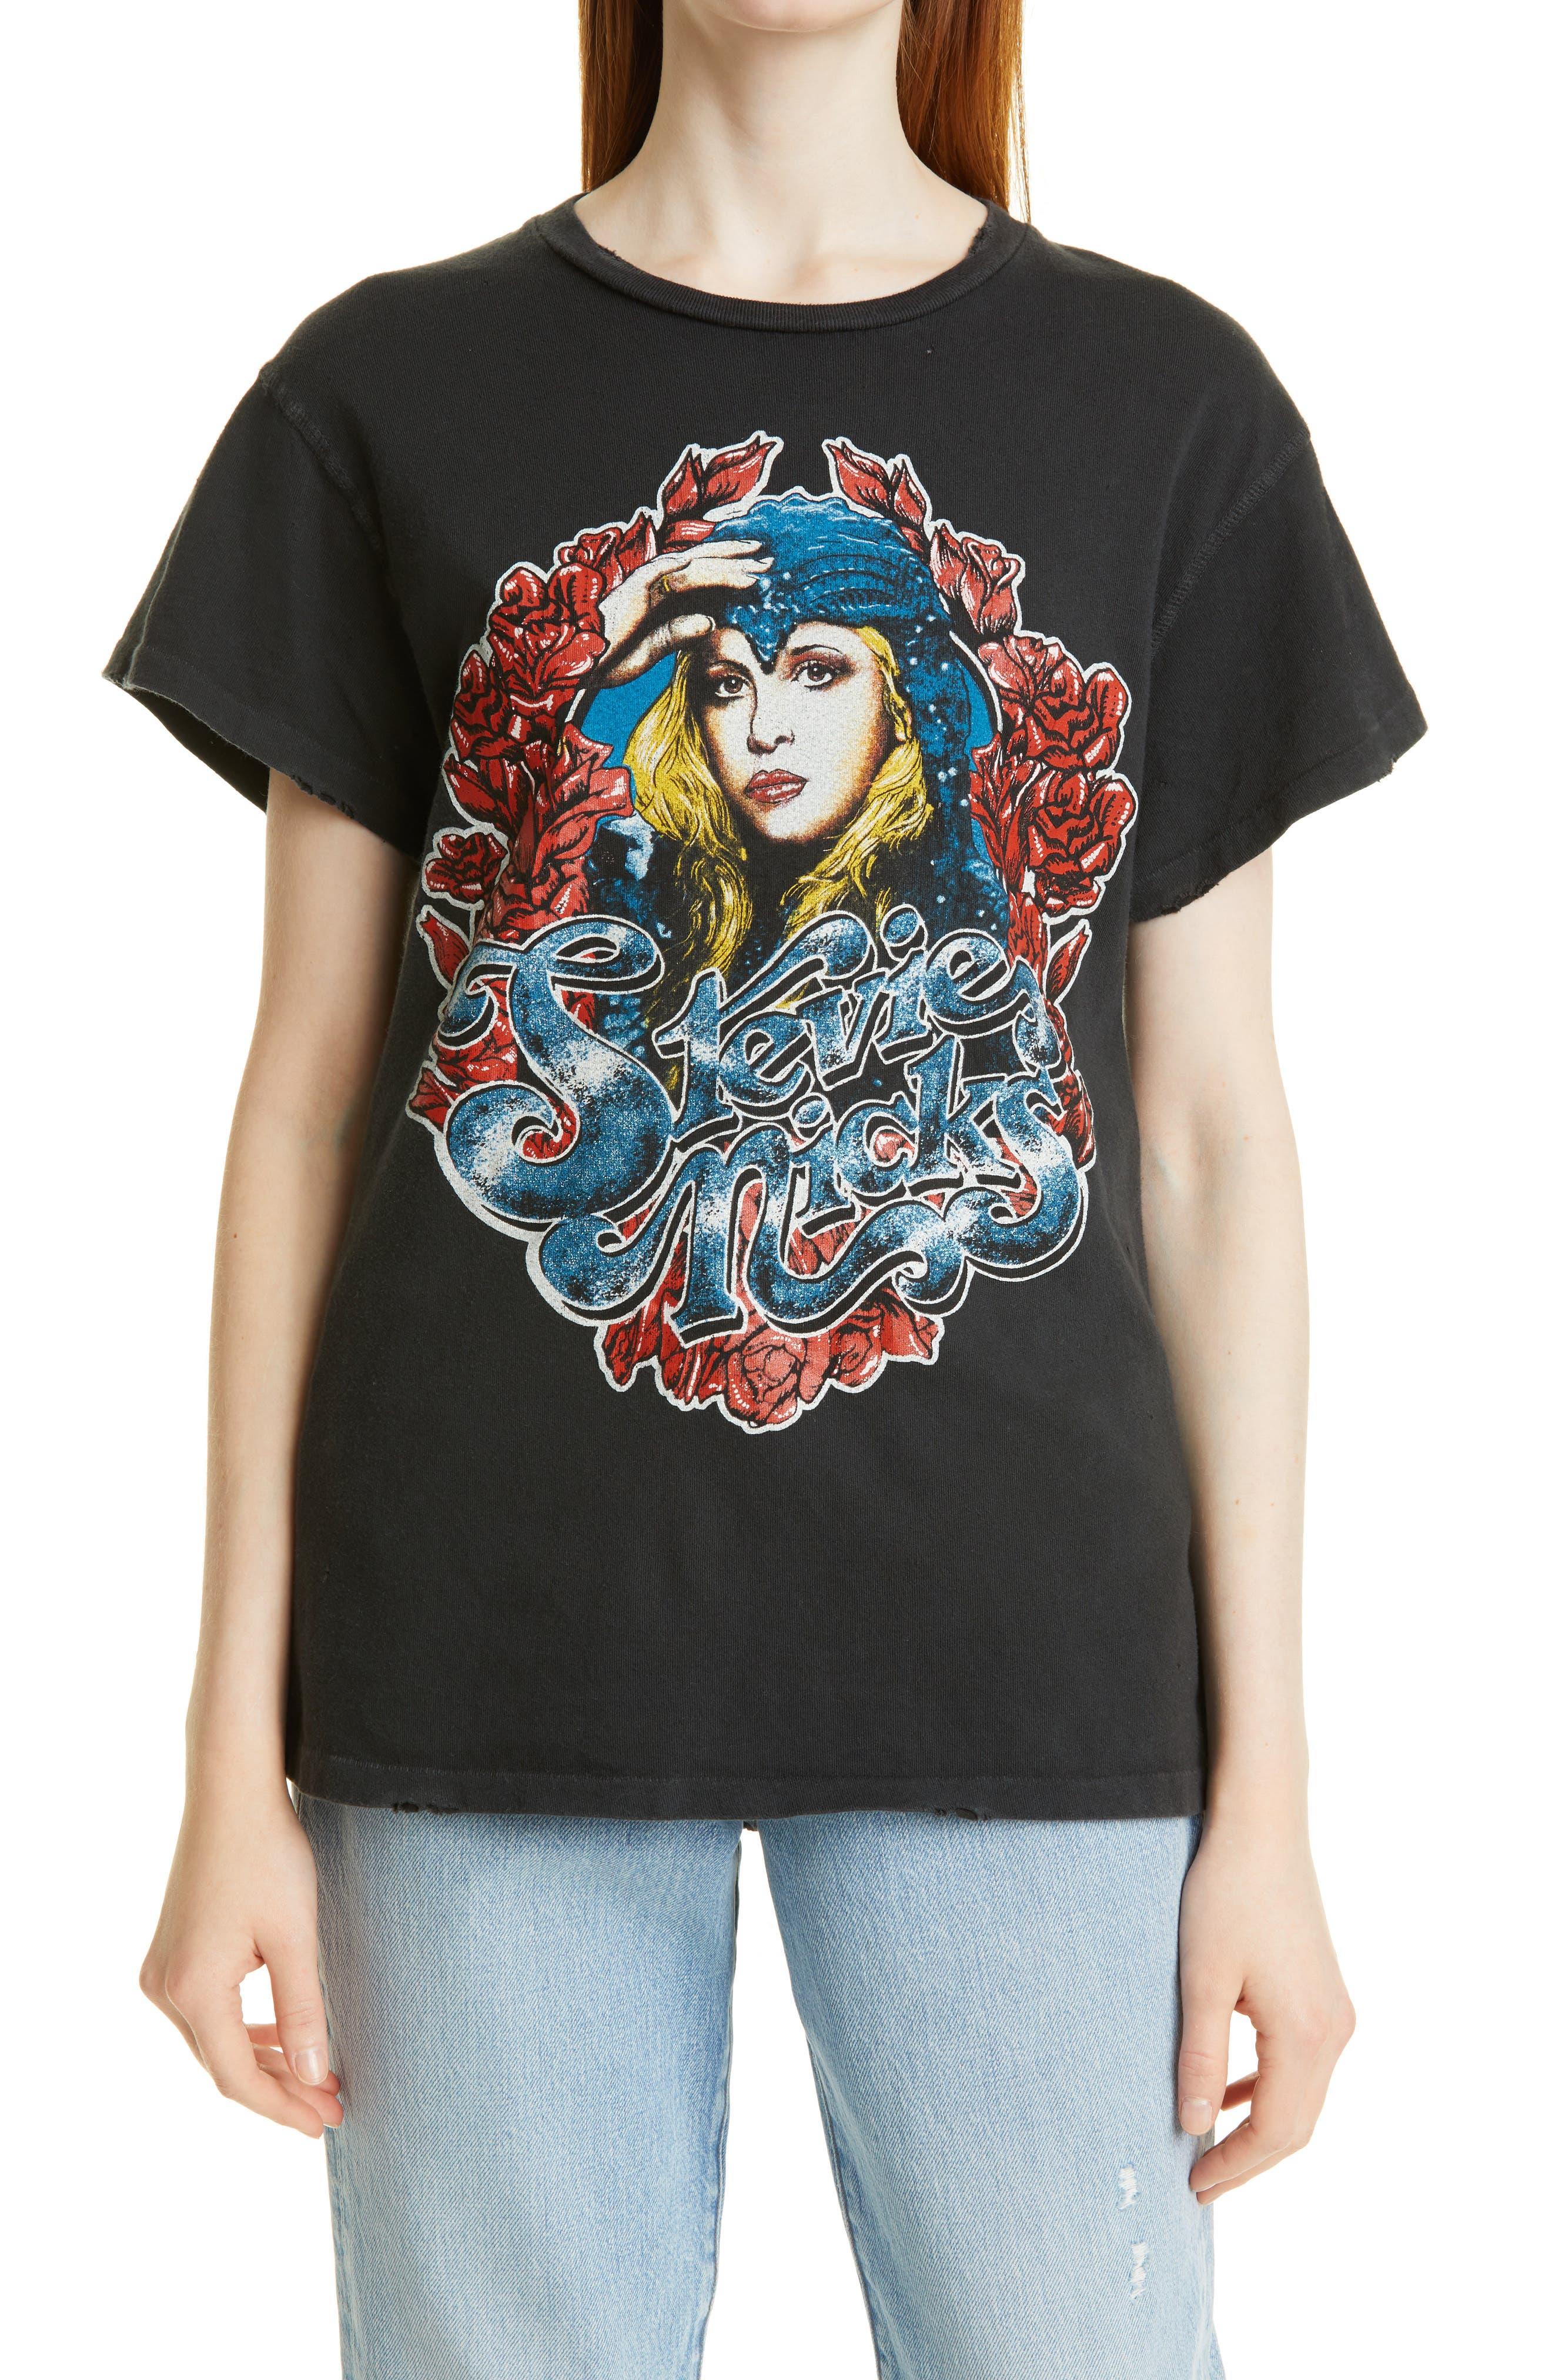 Unisex Stevie Nicks Mystic Graphic Tee